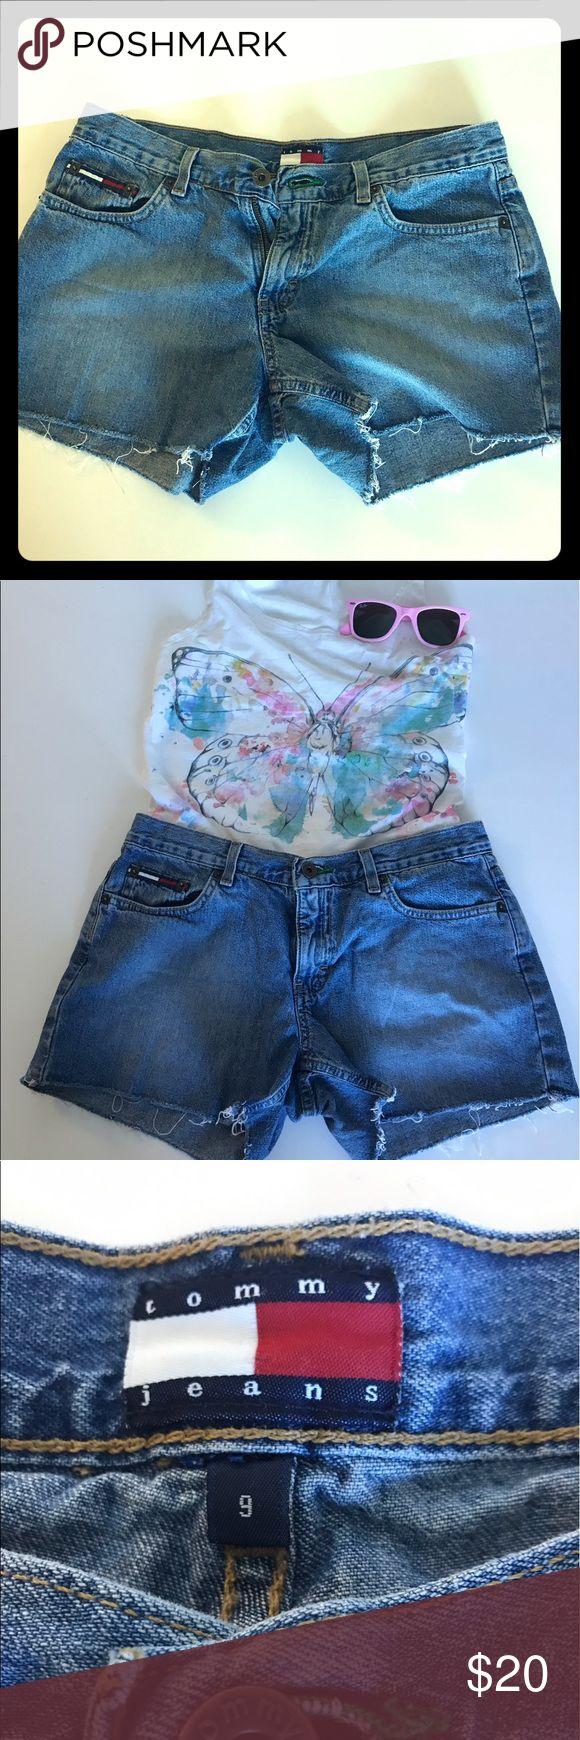 Vintage 90's Tommy Hilfiger Jean shorts Size 9 Vintage cut off Tommy Hilfiger Jean shorts, size 9. Tommy Hilfiger Shorts Jean Shorts